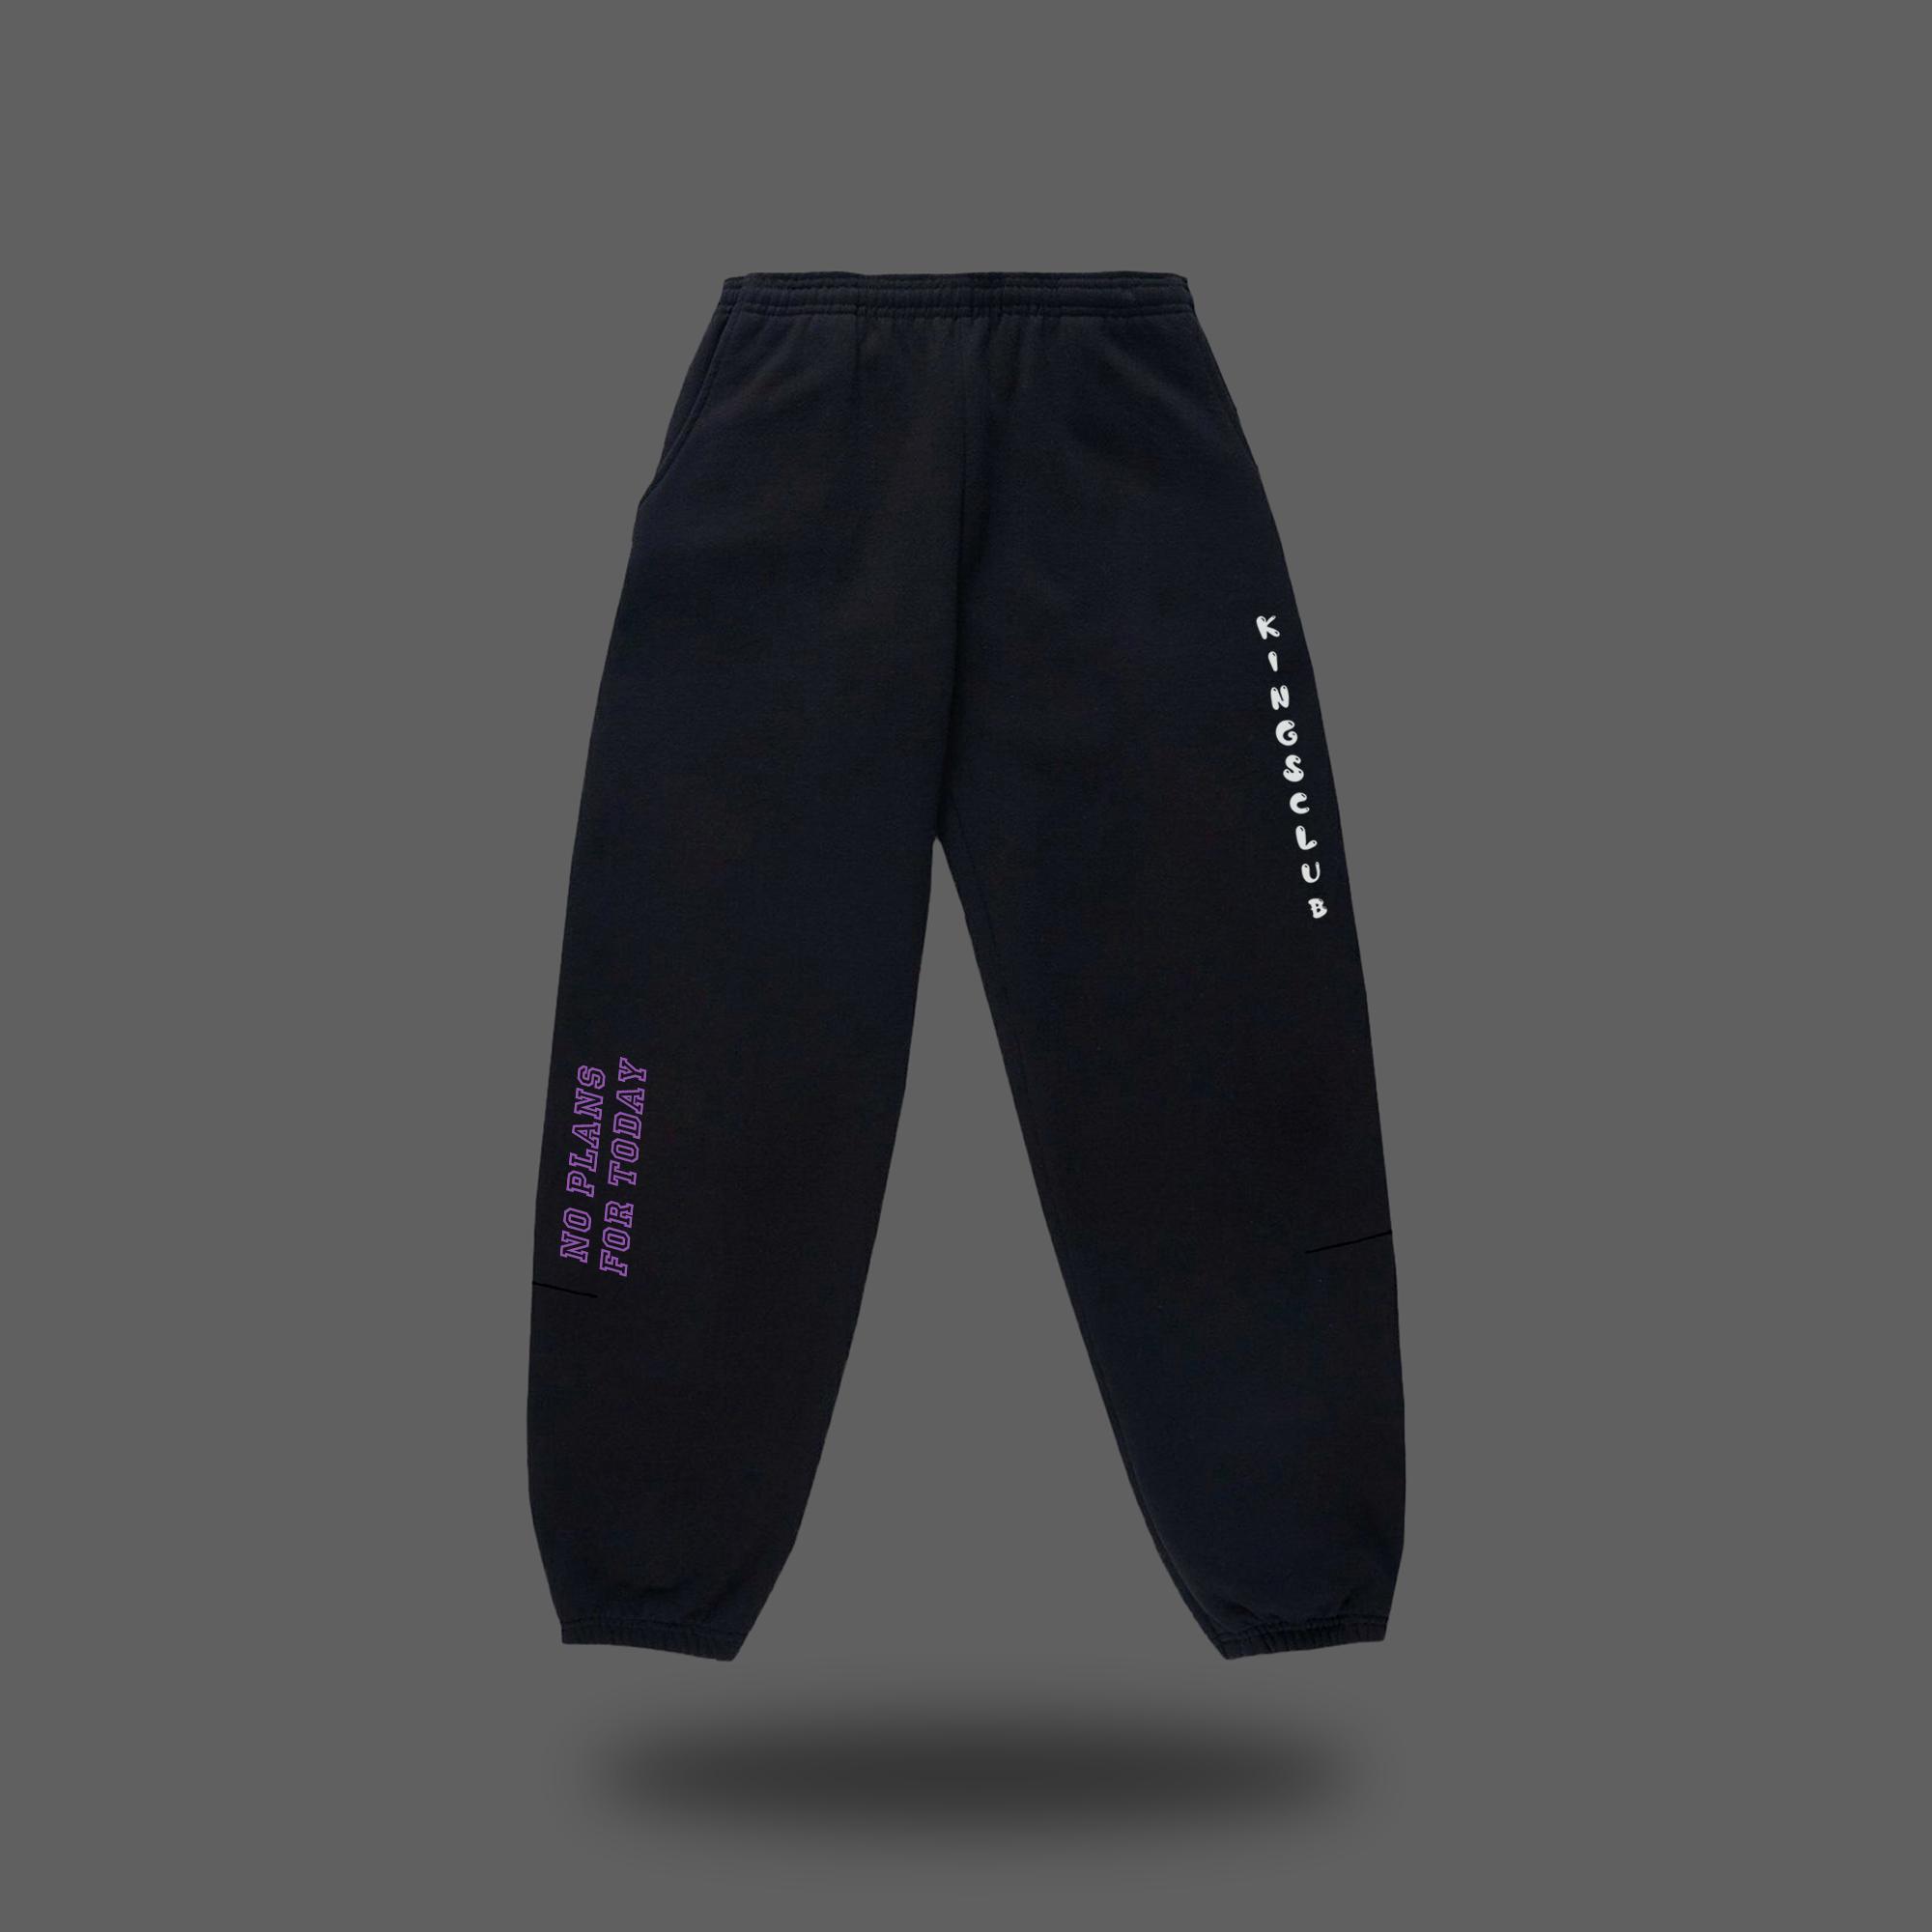 Kings Club Sweatpants - Black